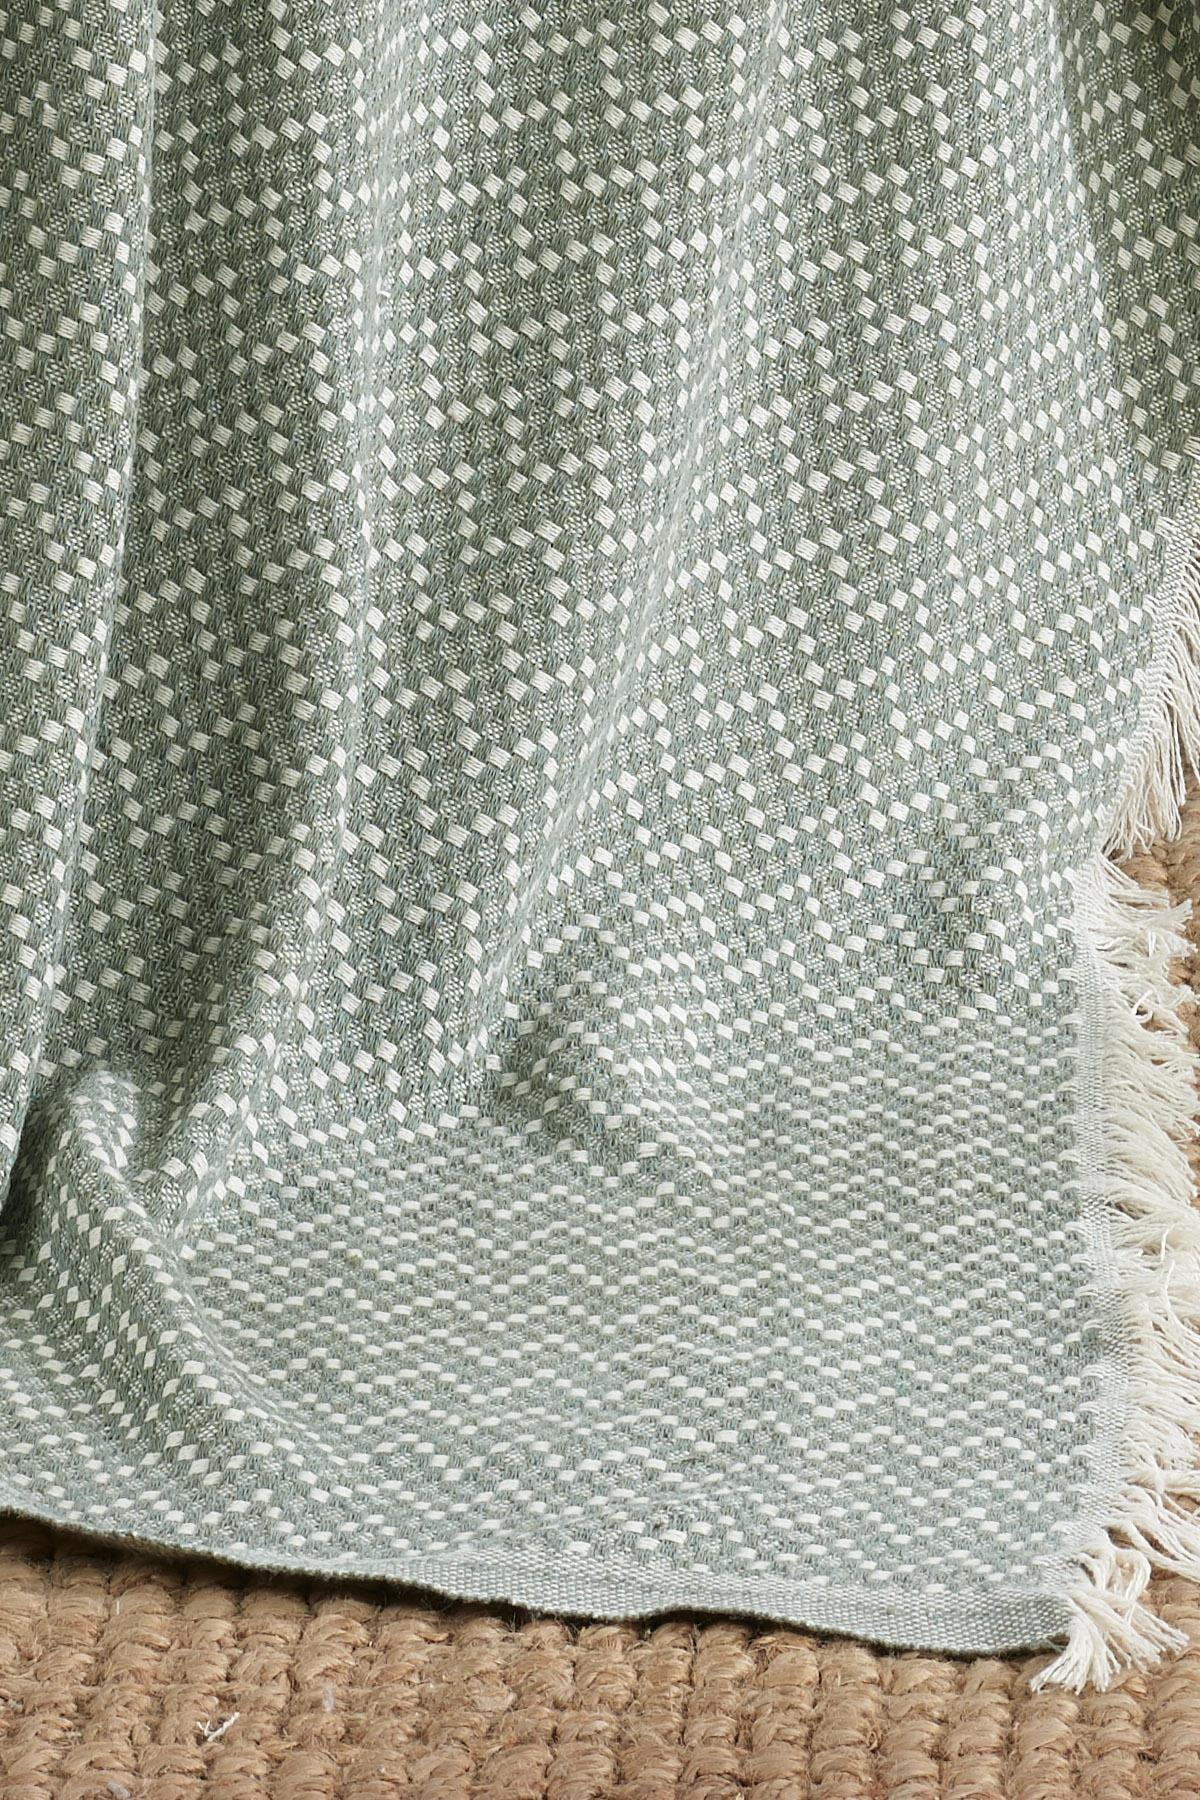 Fushia Natural Keten Koltuk Örtüsü Kara Tezgah Dokuma Koltuk Şalı 2